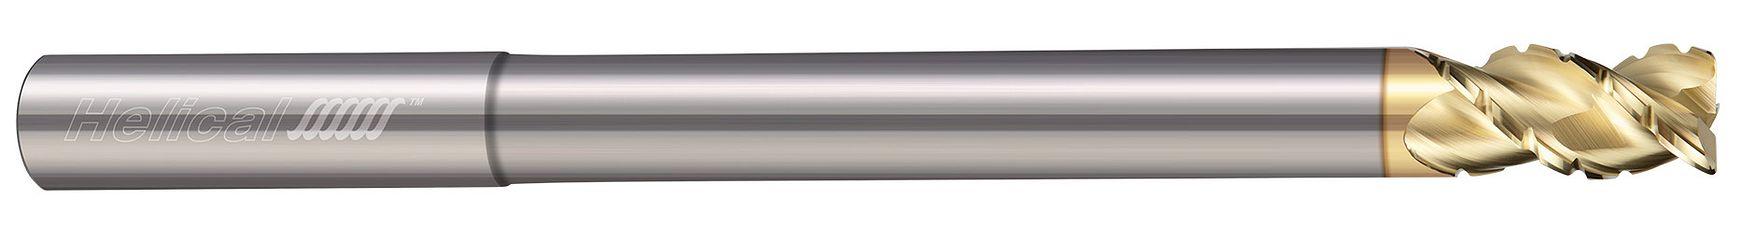 3 Flute, Corner Radius - 45° Helix, Chipbreaker Rougher, Reduced Neck